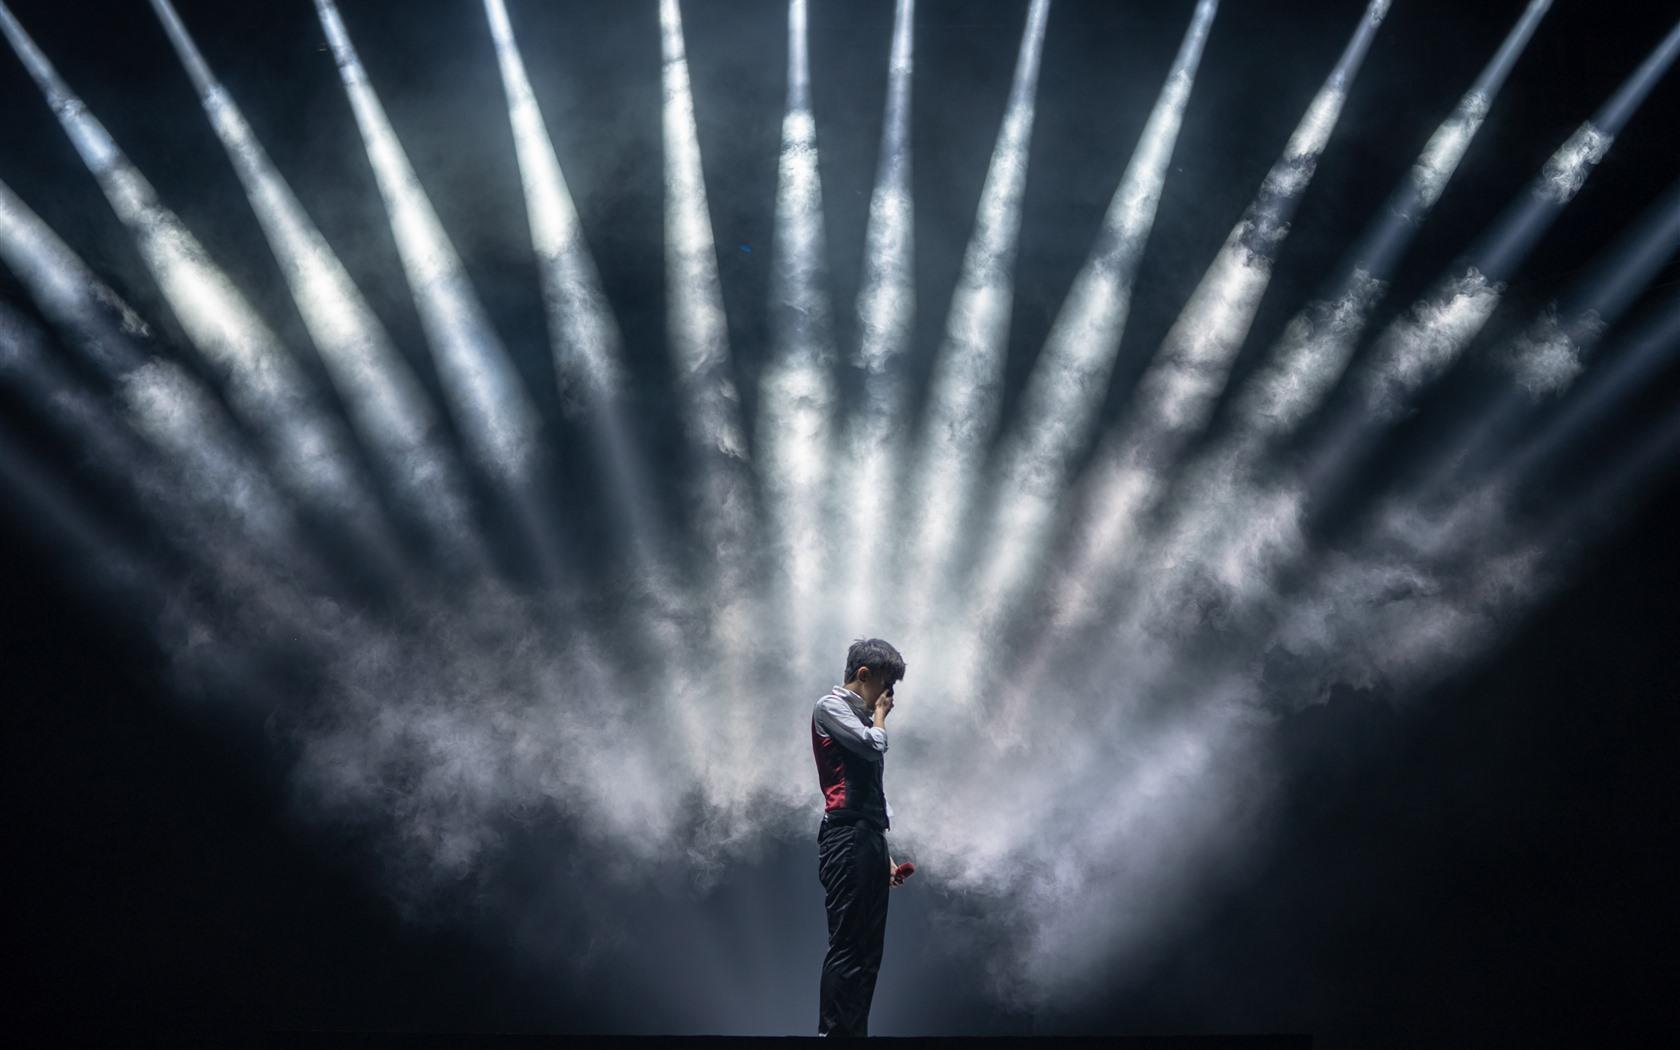 Wallpaper Concert Stage Lighting Smoke 5120x2880 Uhd 5k